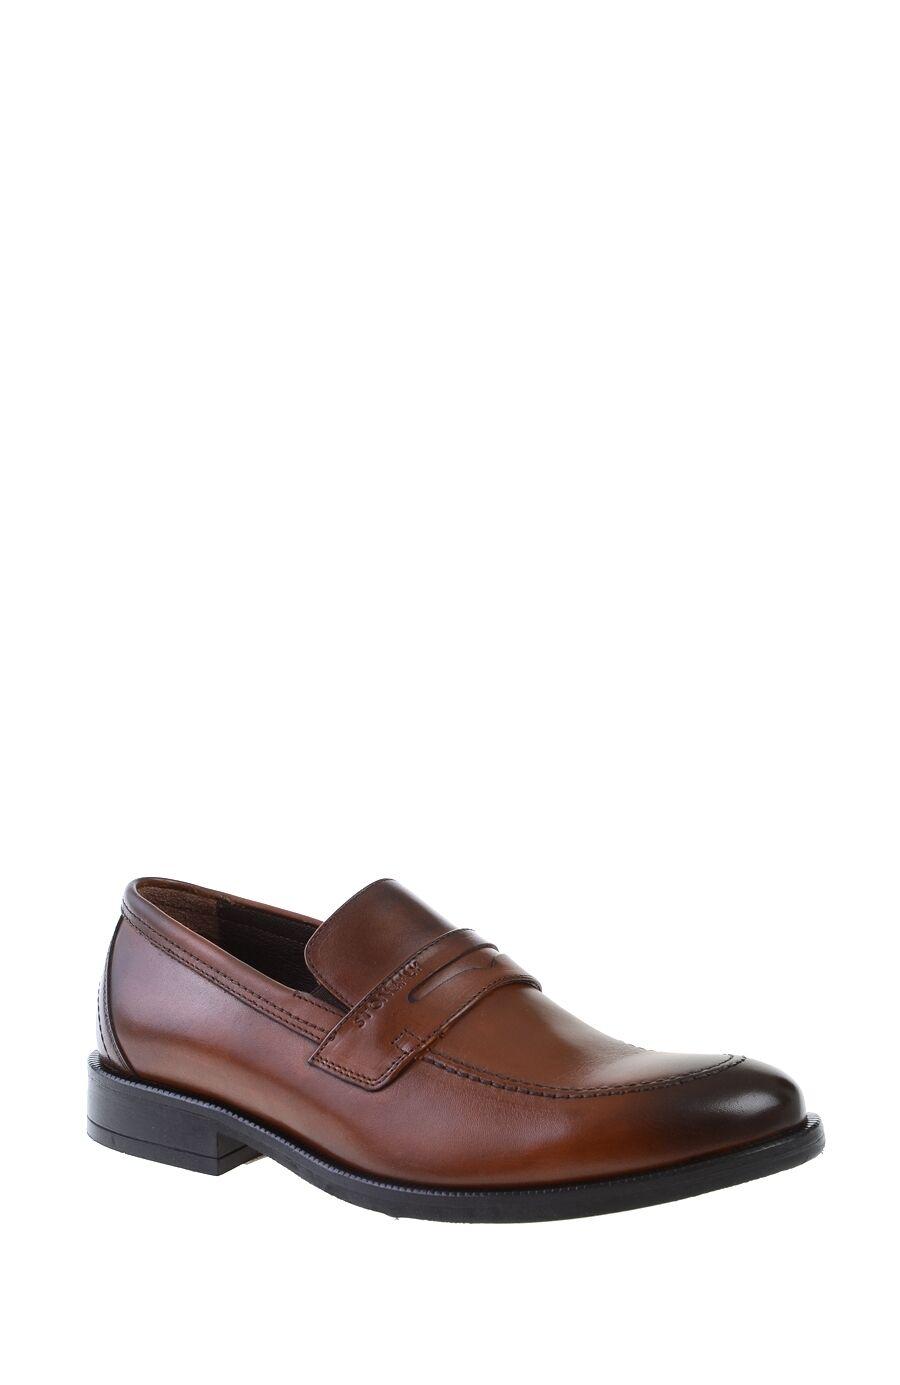 Kahverengi Deri Loafer Ayakkabı